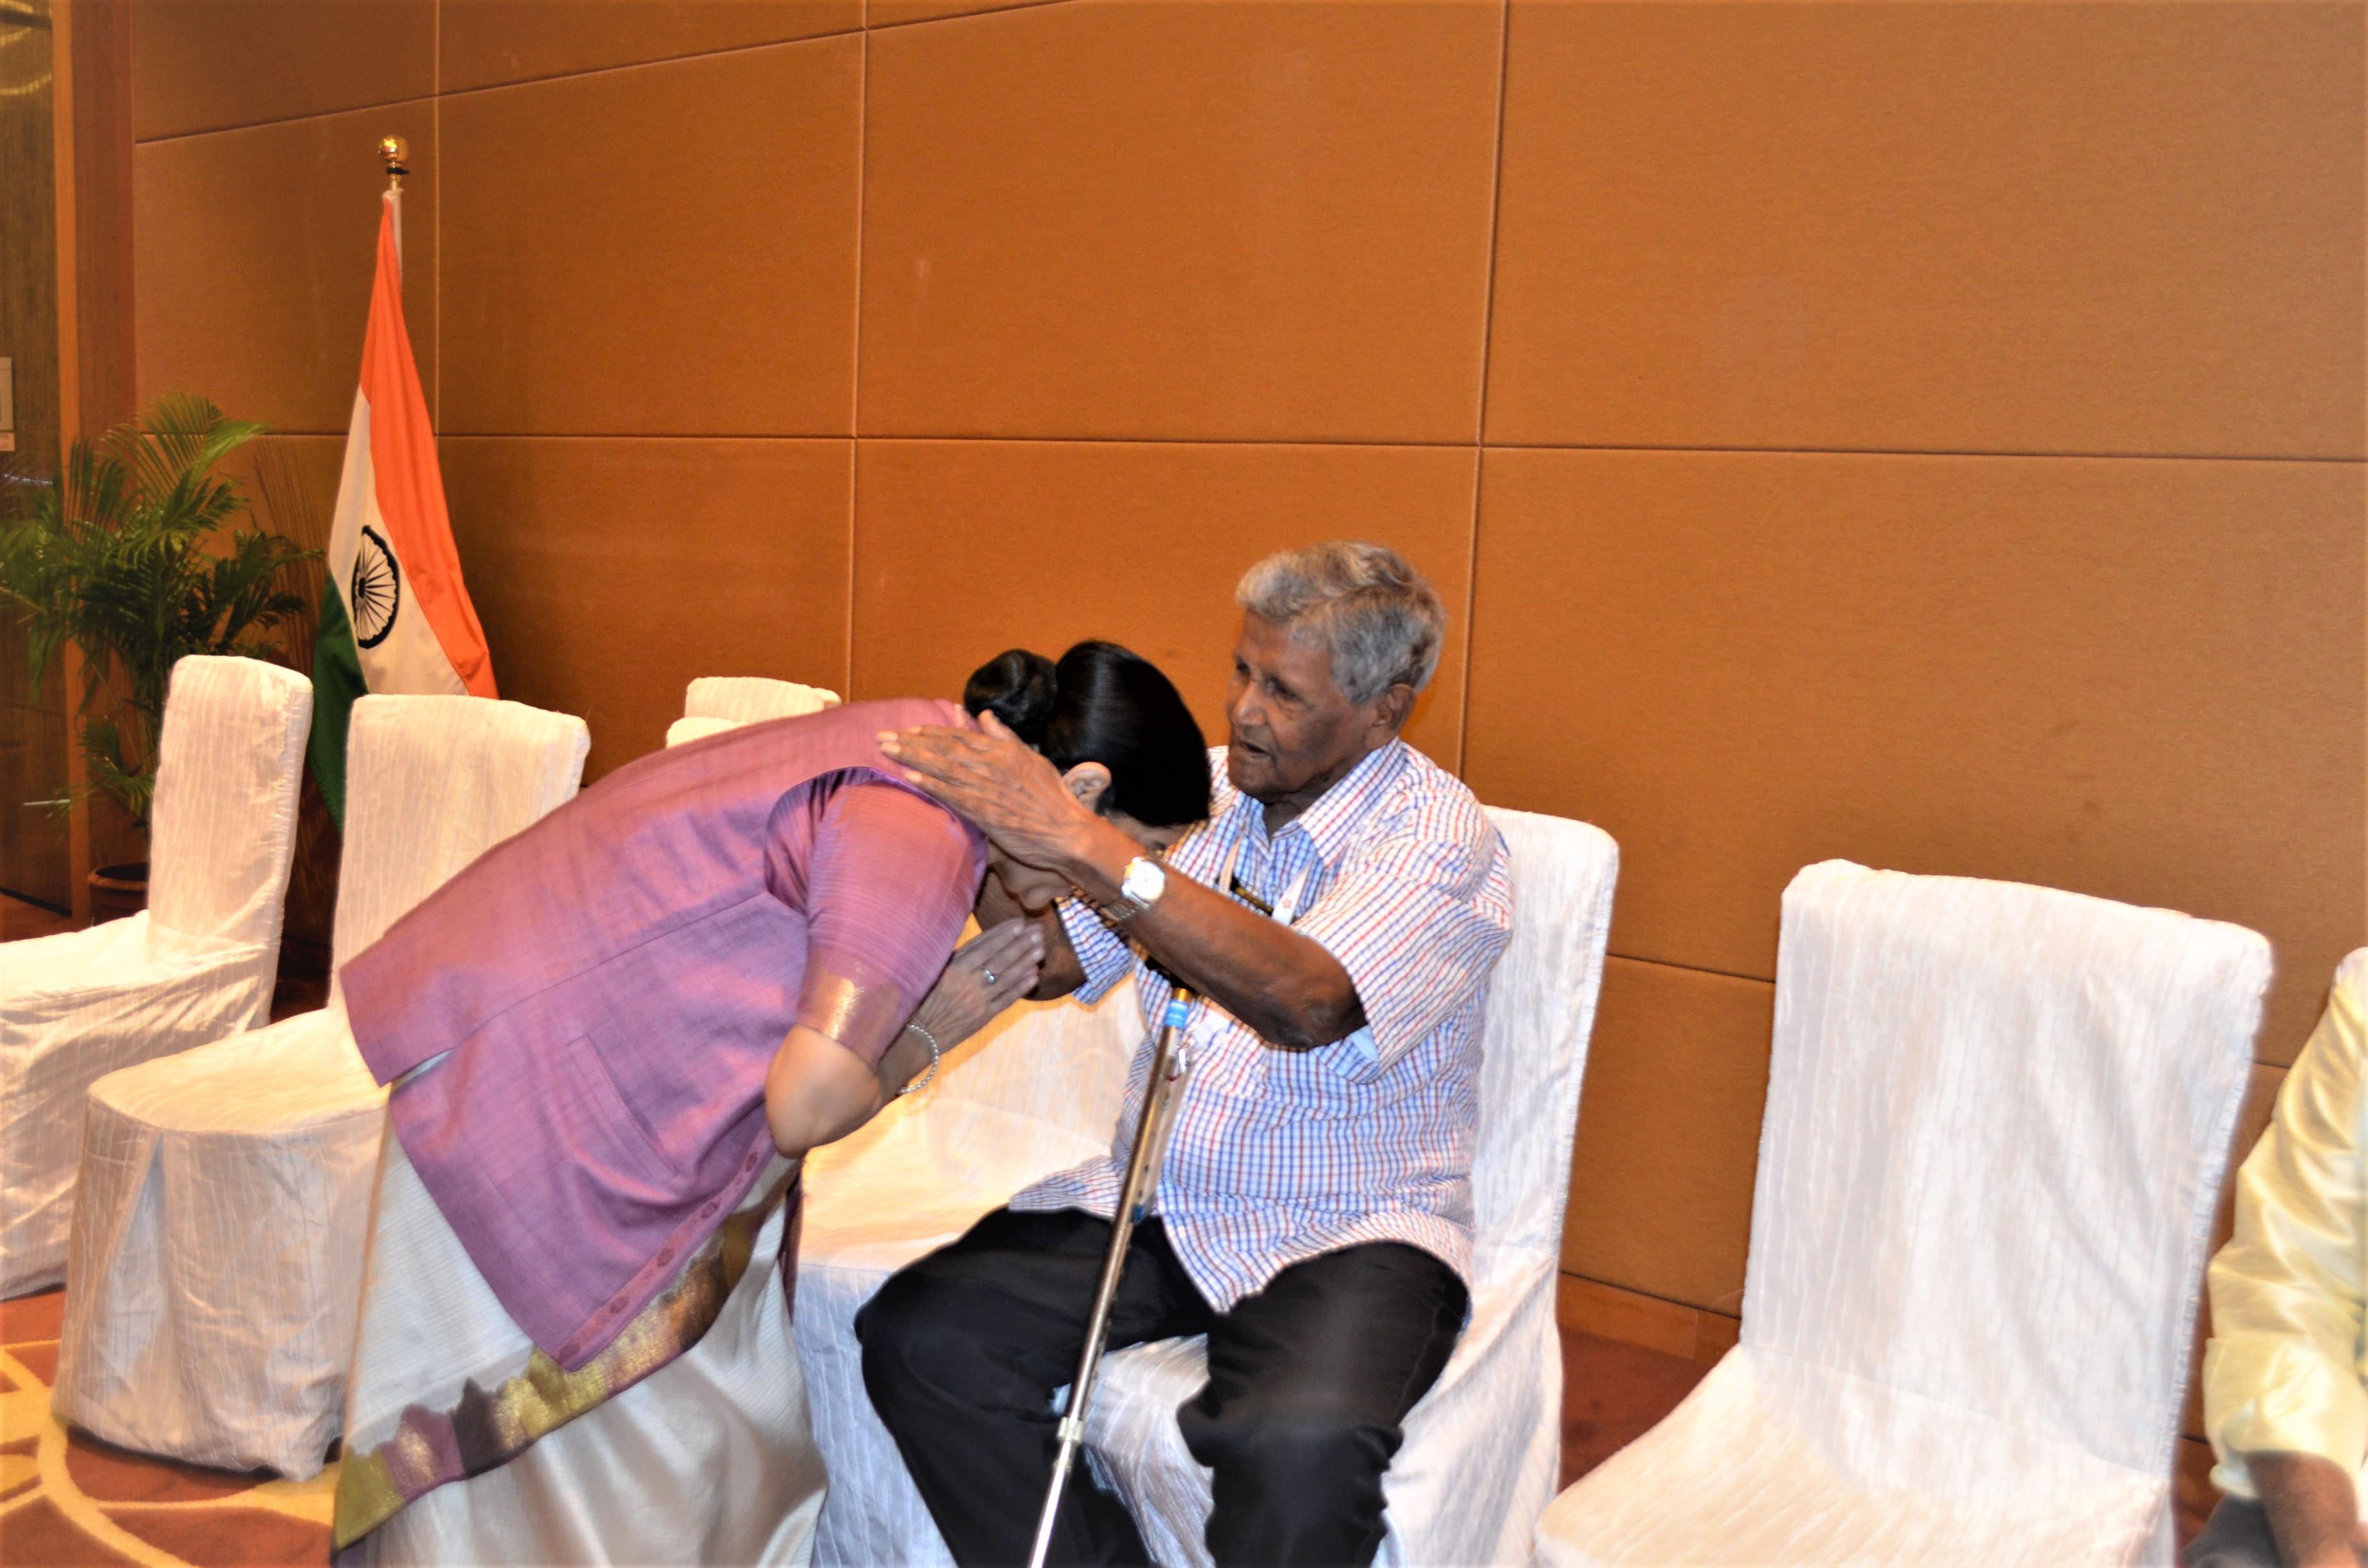 Sushma Swaraj greeting Indian National Army veteran at the ASEAN India PBD.